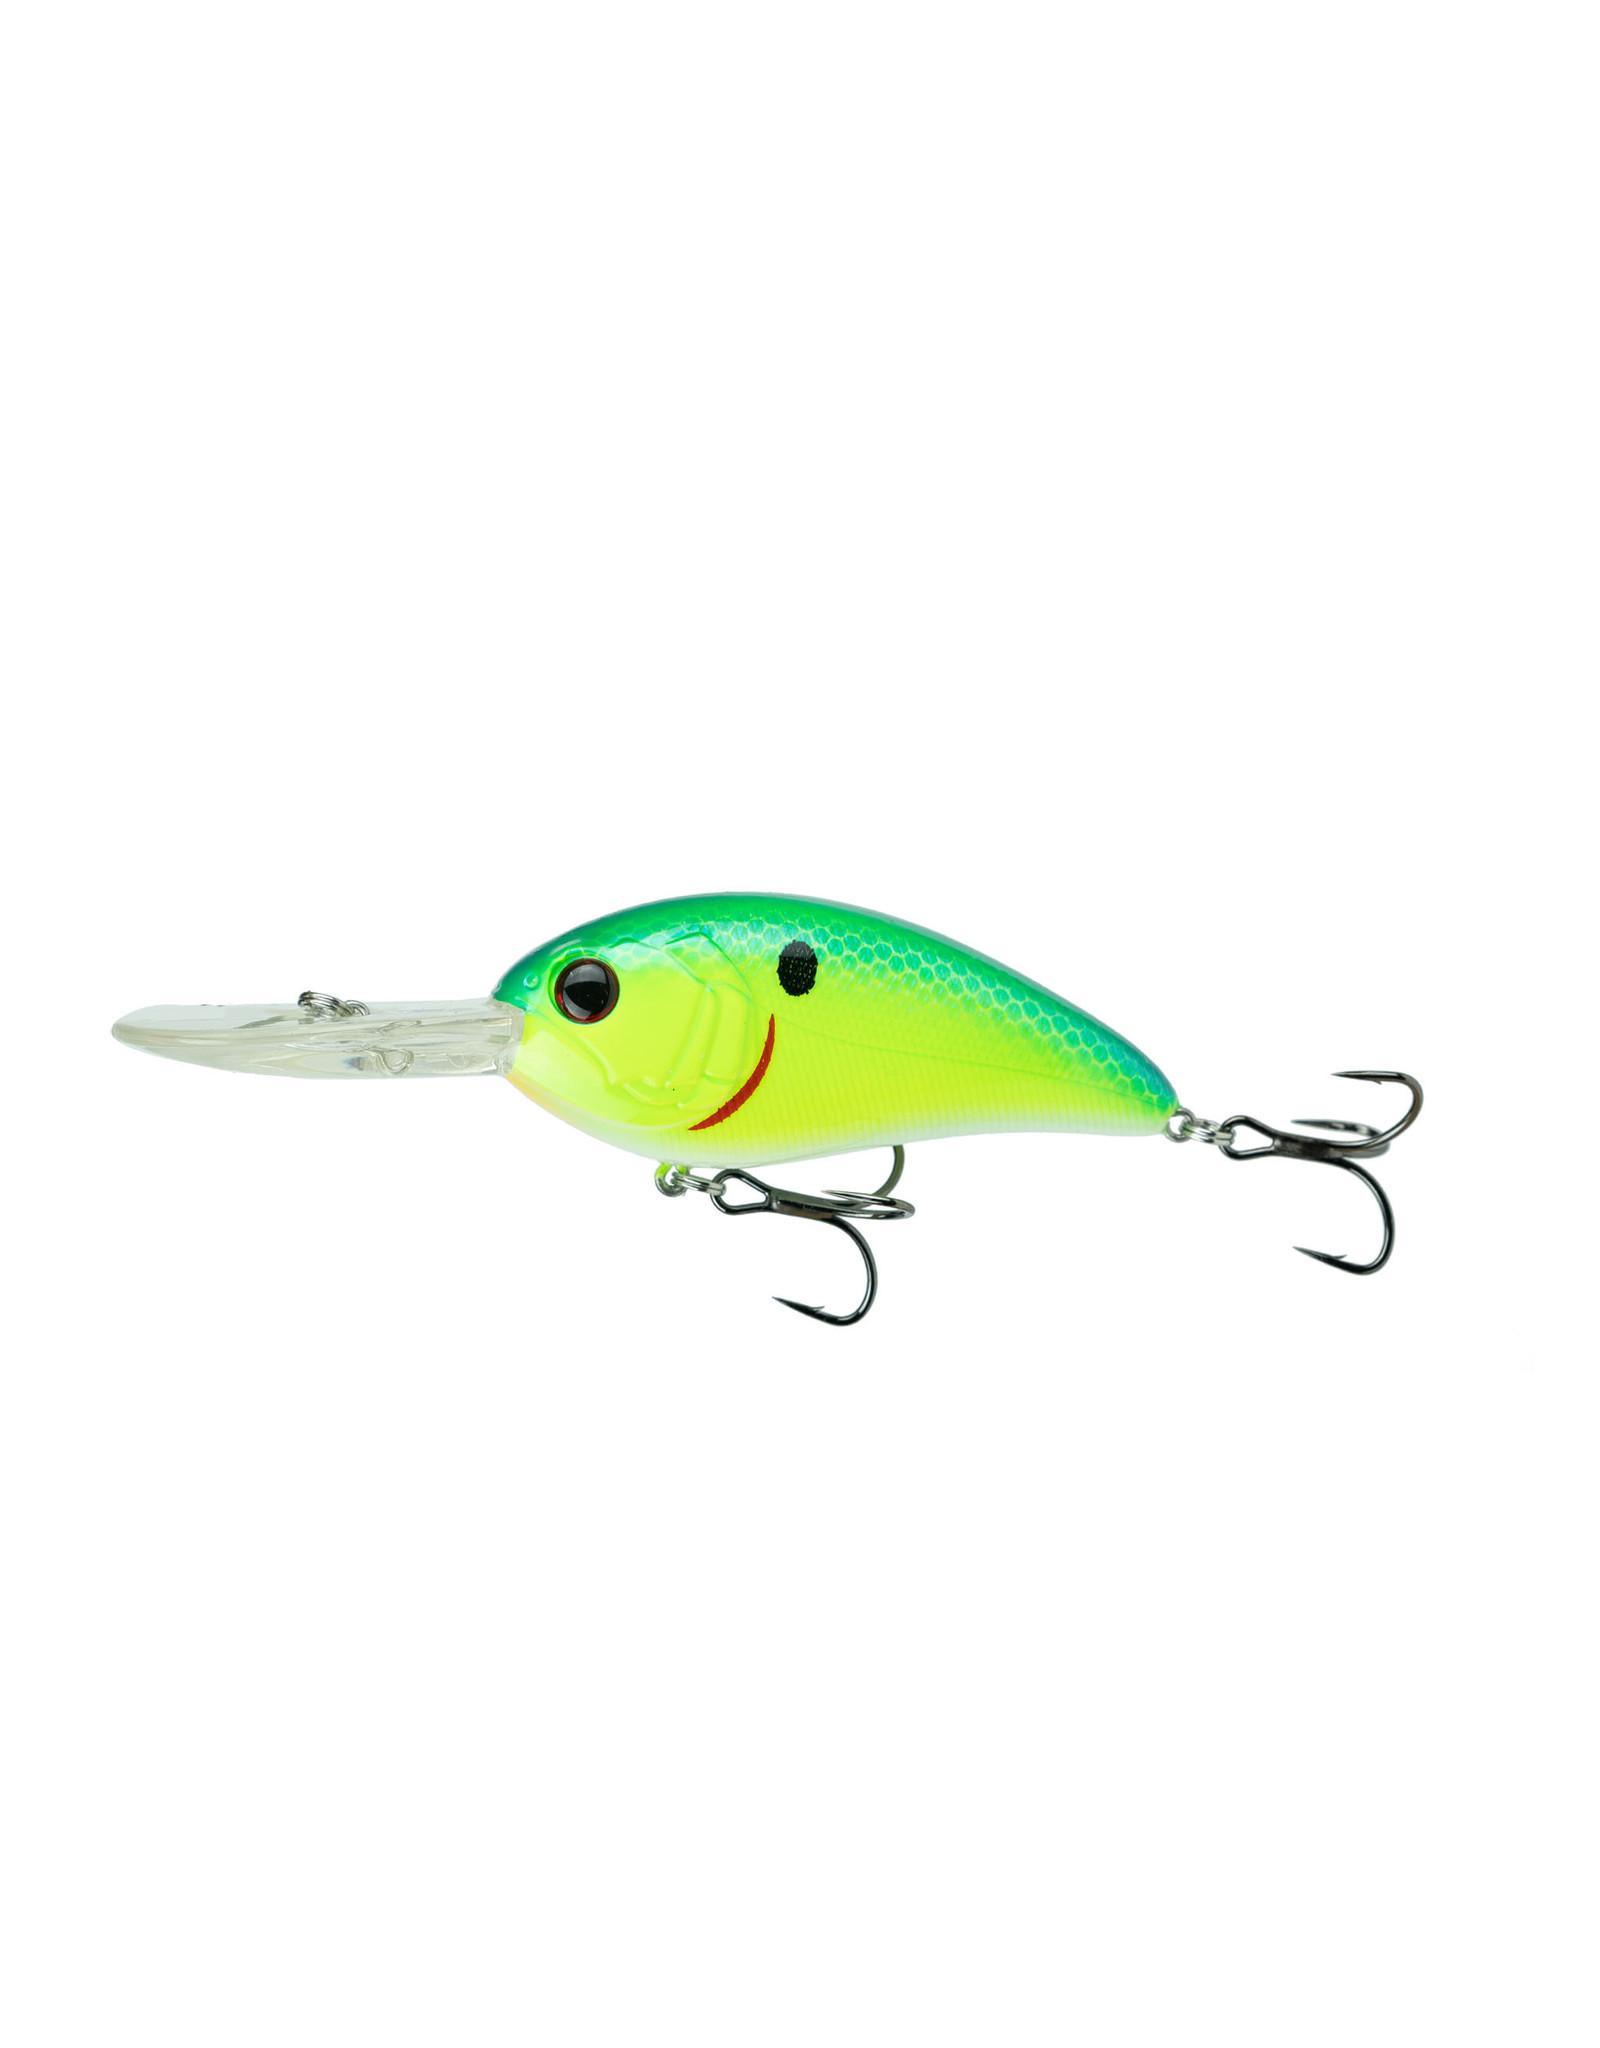 6th Sense Fishing 6th Sense Crush 300DD Crankbait